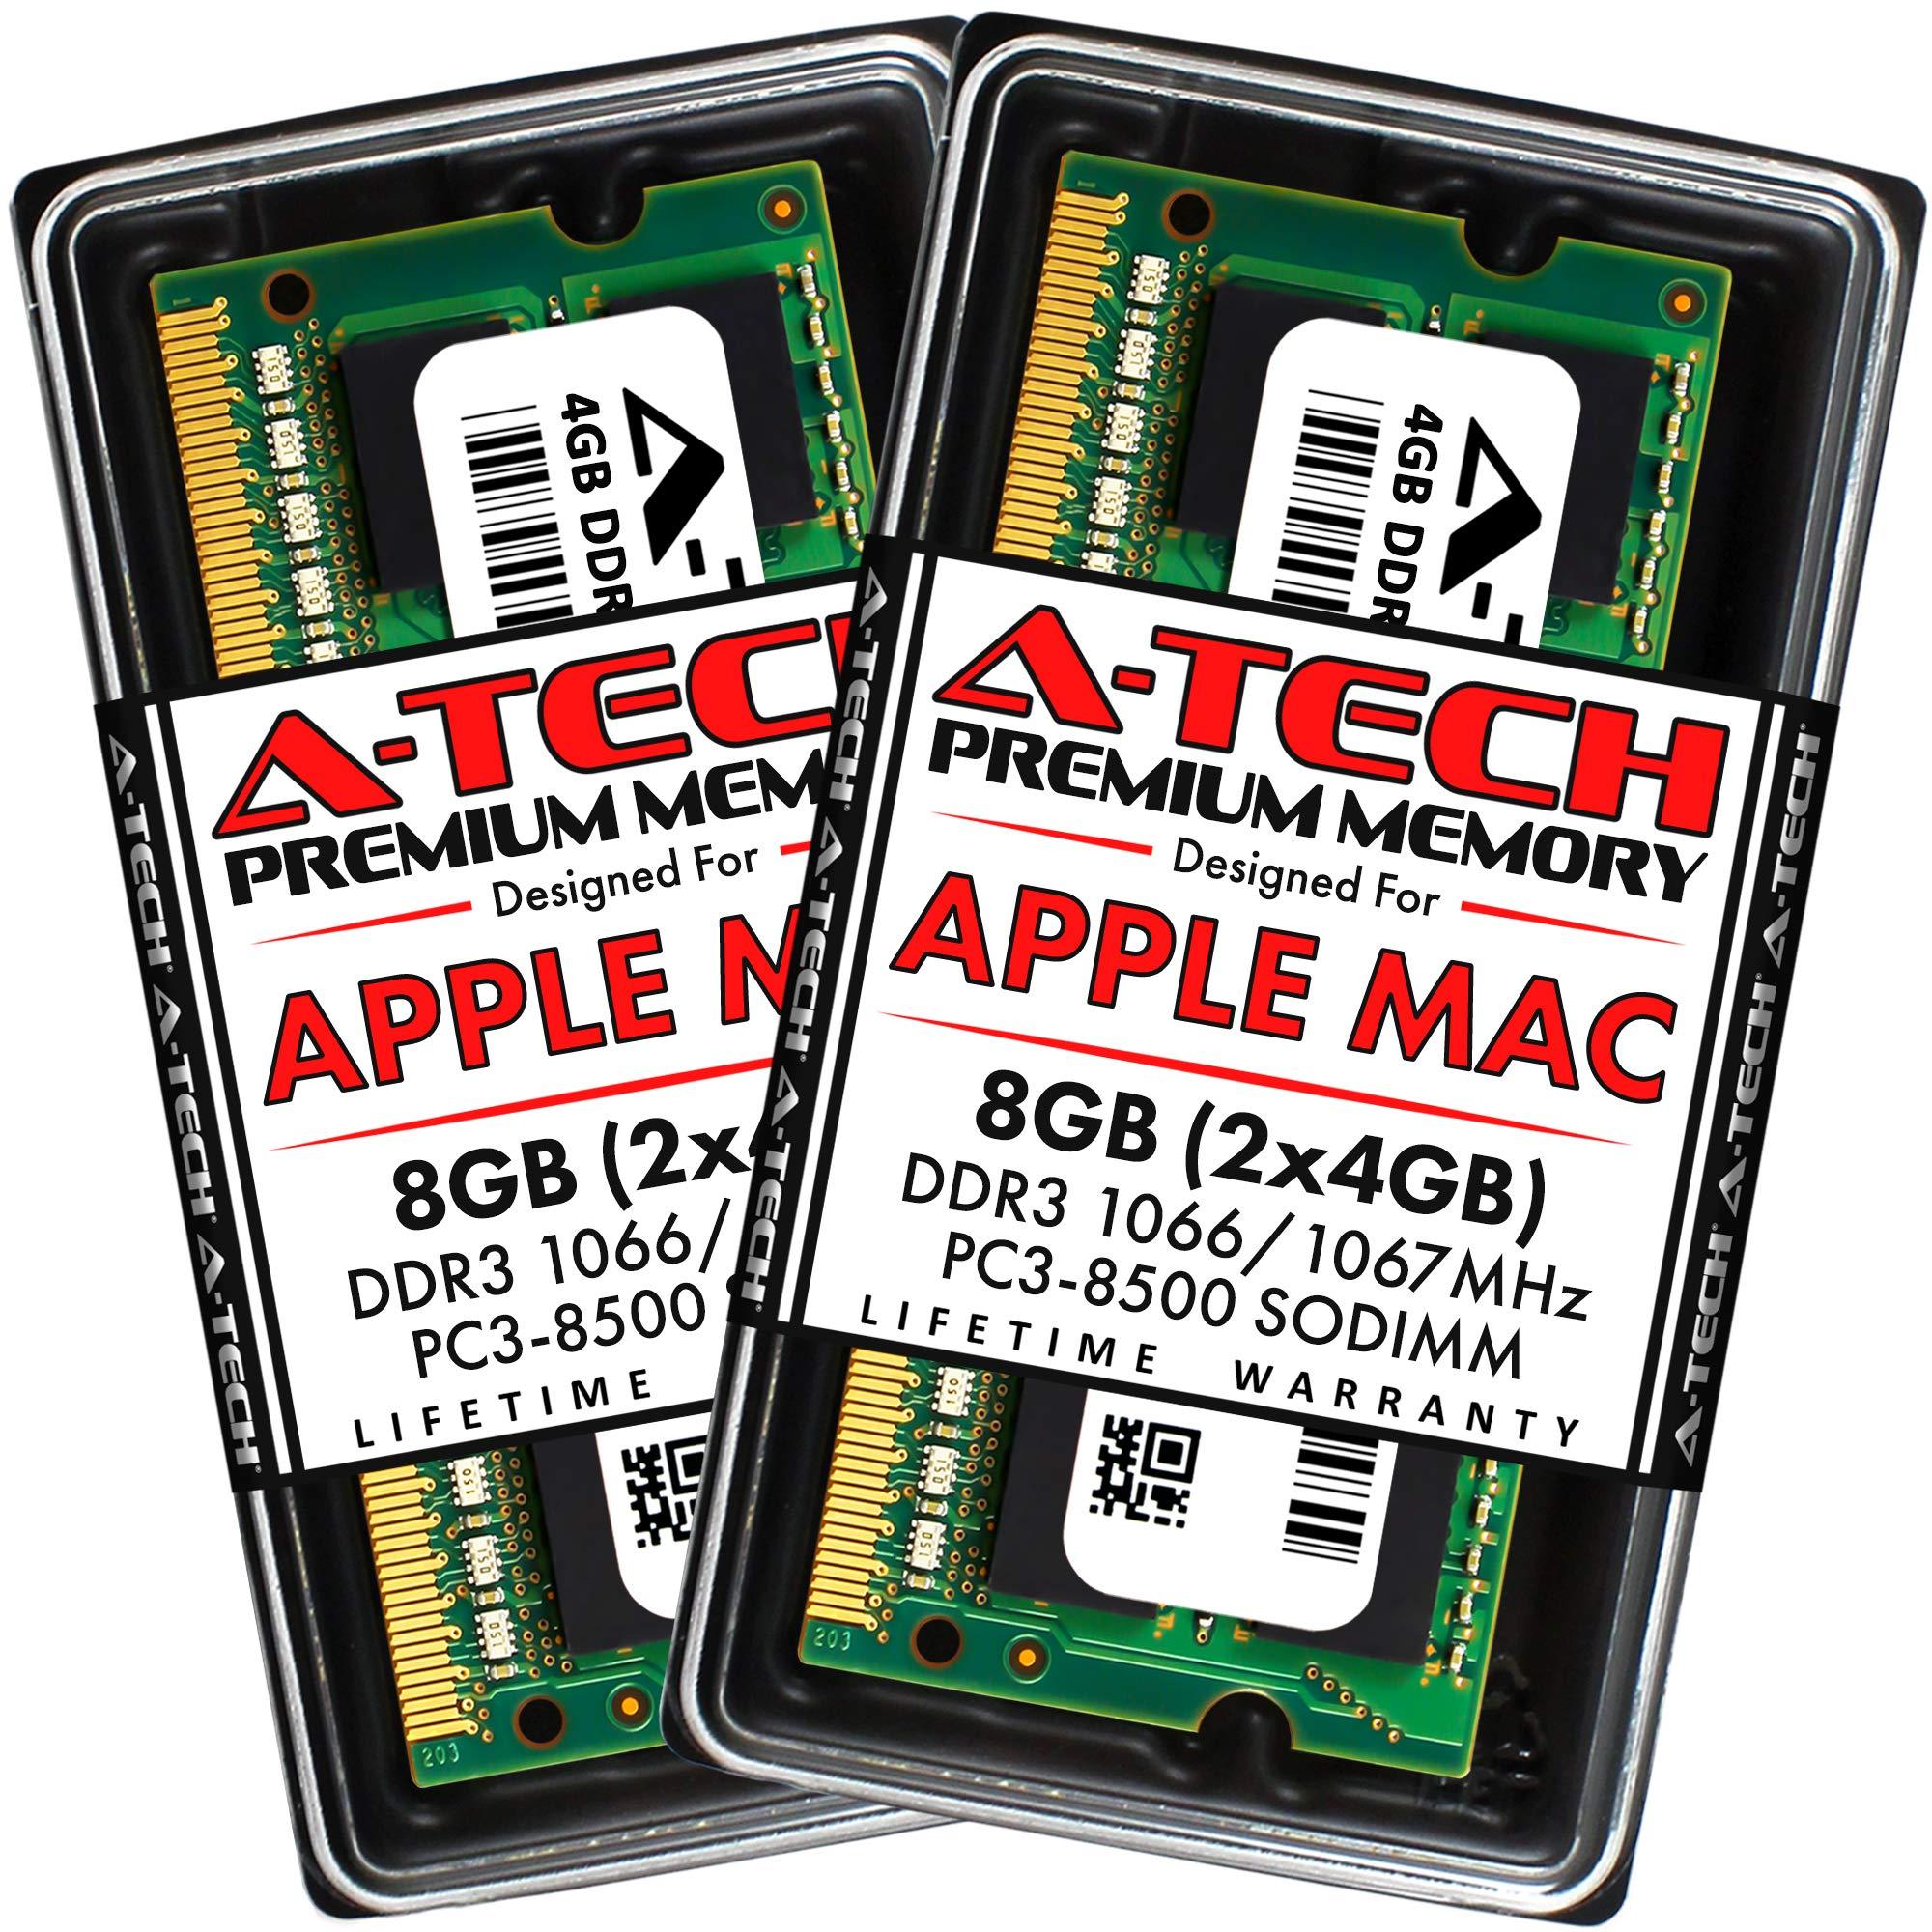 A-Tech 8GB (2 x 4GB) PC3-8500 DDR3 1066/1067 MHz RAM for MacBook, MacBook Pro, iMac, Mac Mini (Late 2008, Early/Mid/Late 2009, Mid 2010)   204-Pin SODIMM Memory Kit